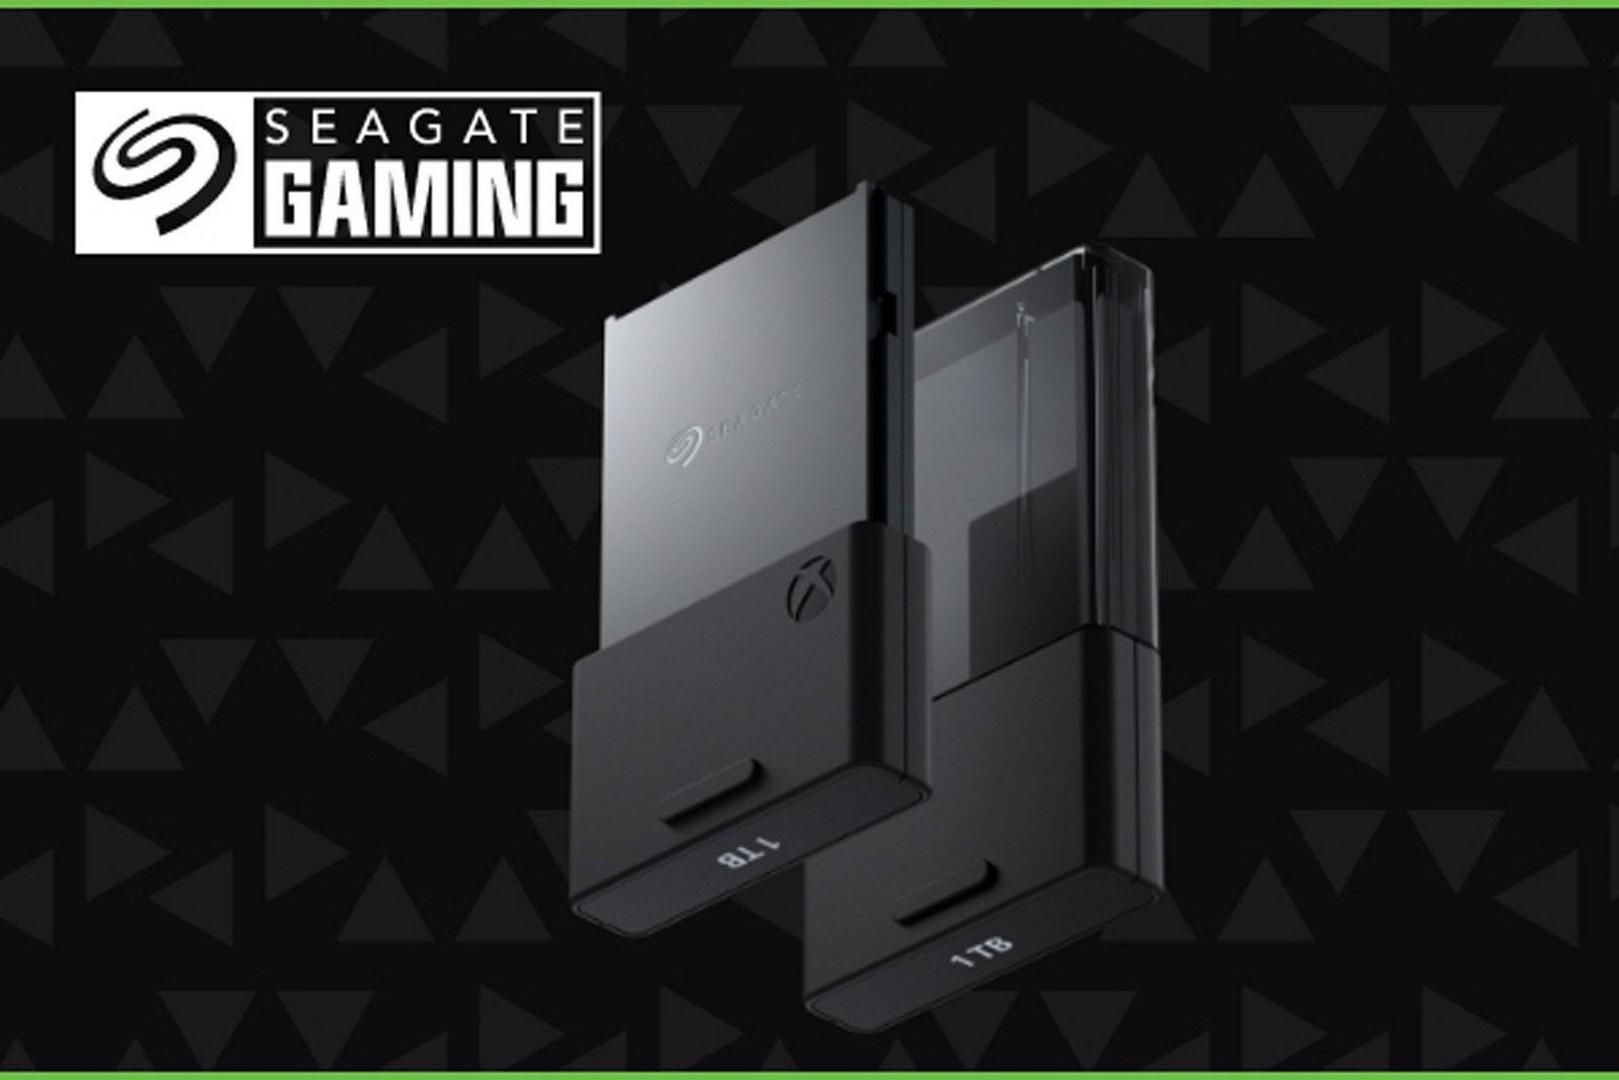 وحدة تخزين Xbox Series X من Seagate